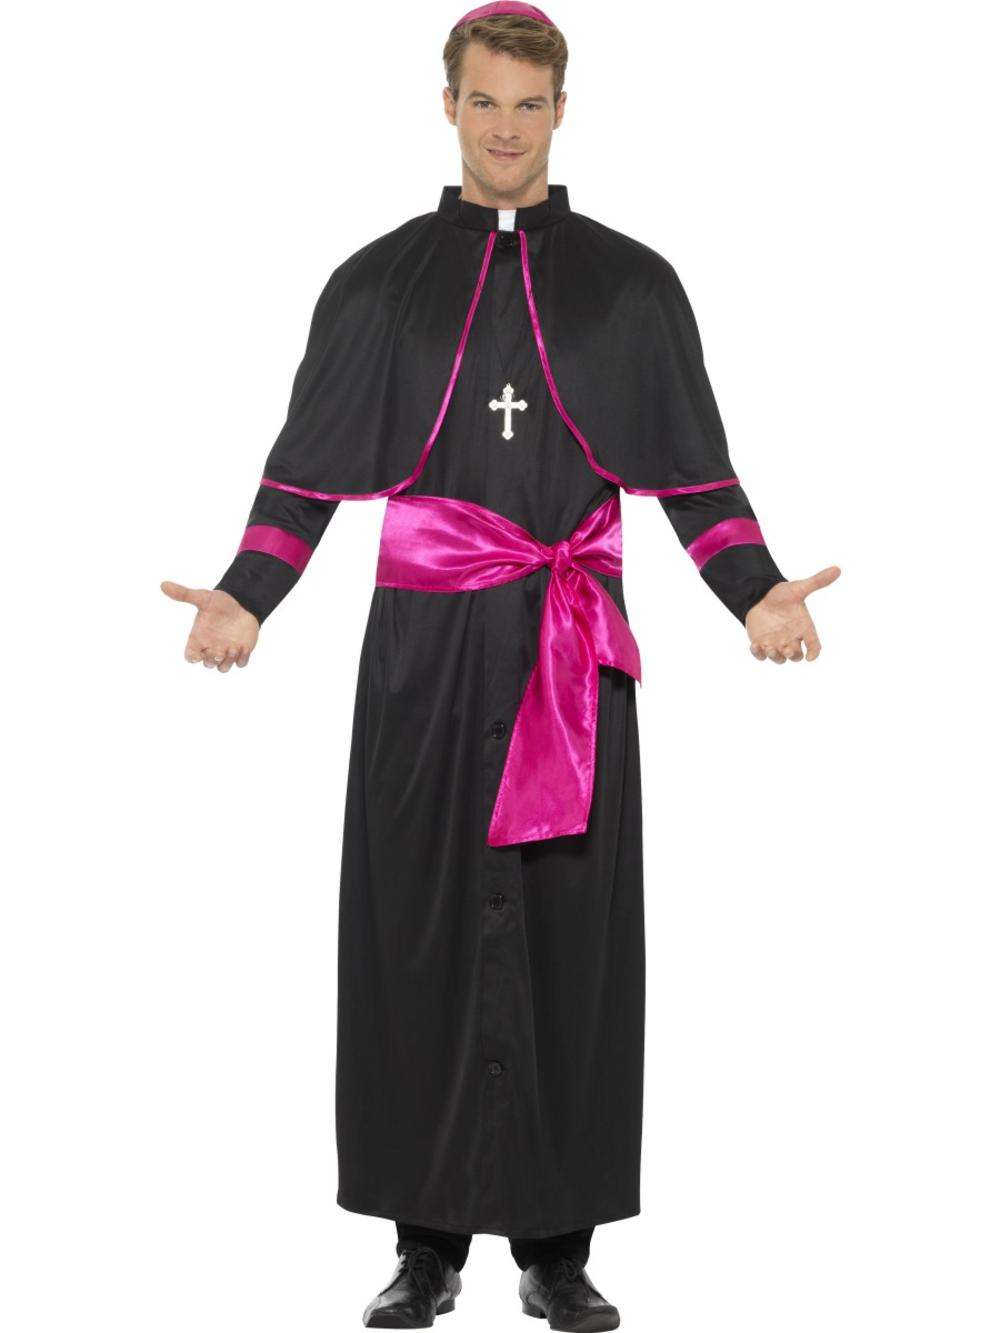 Cardinal Men's Fancy Dress Religious Catholic Holy Pope Saints Adult's Costume